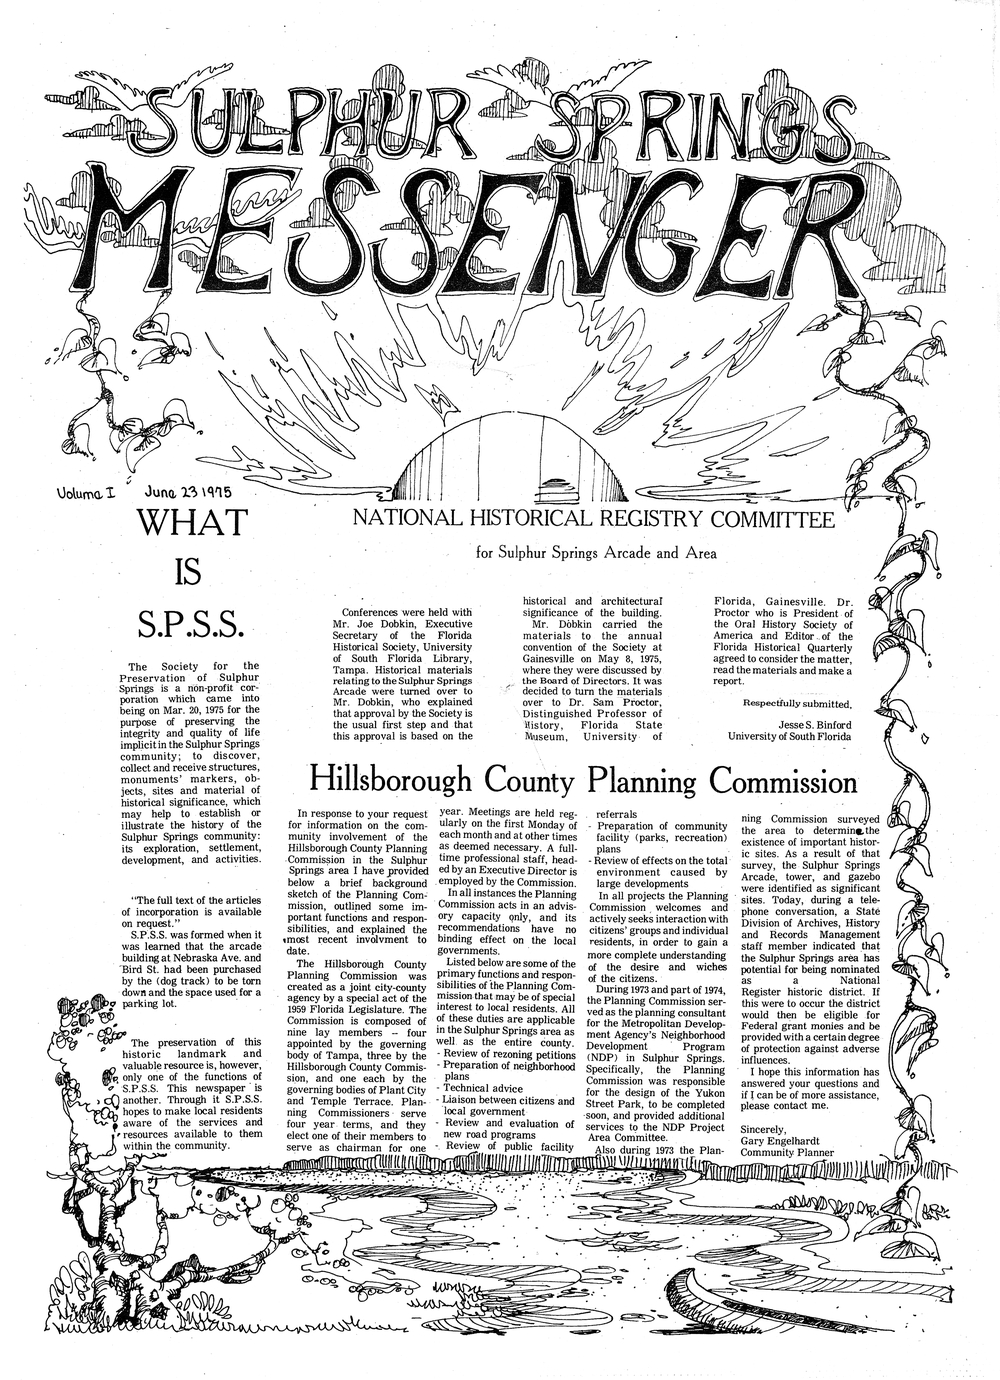 Sulphur Springs Messenger. June 23, 1975. - Page 1